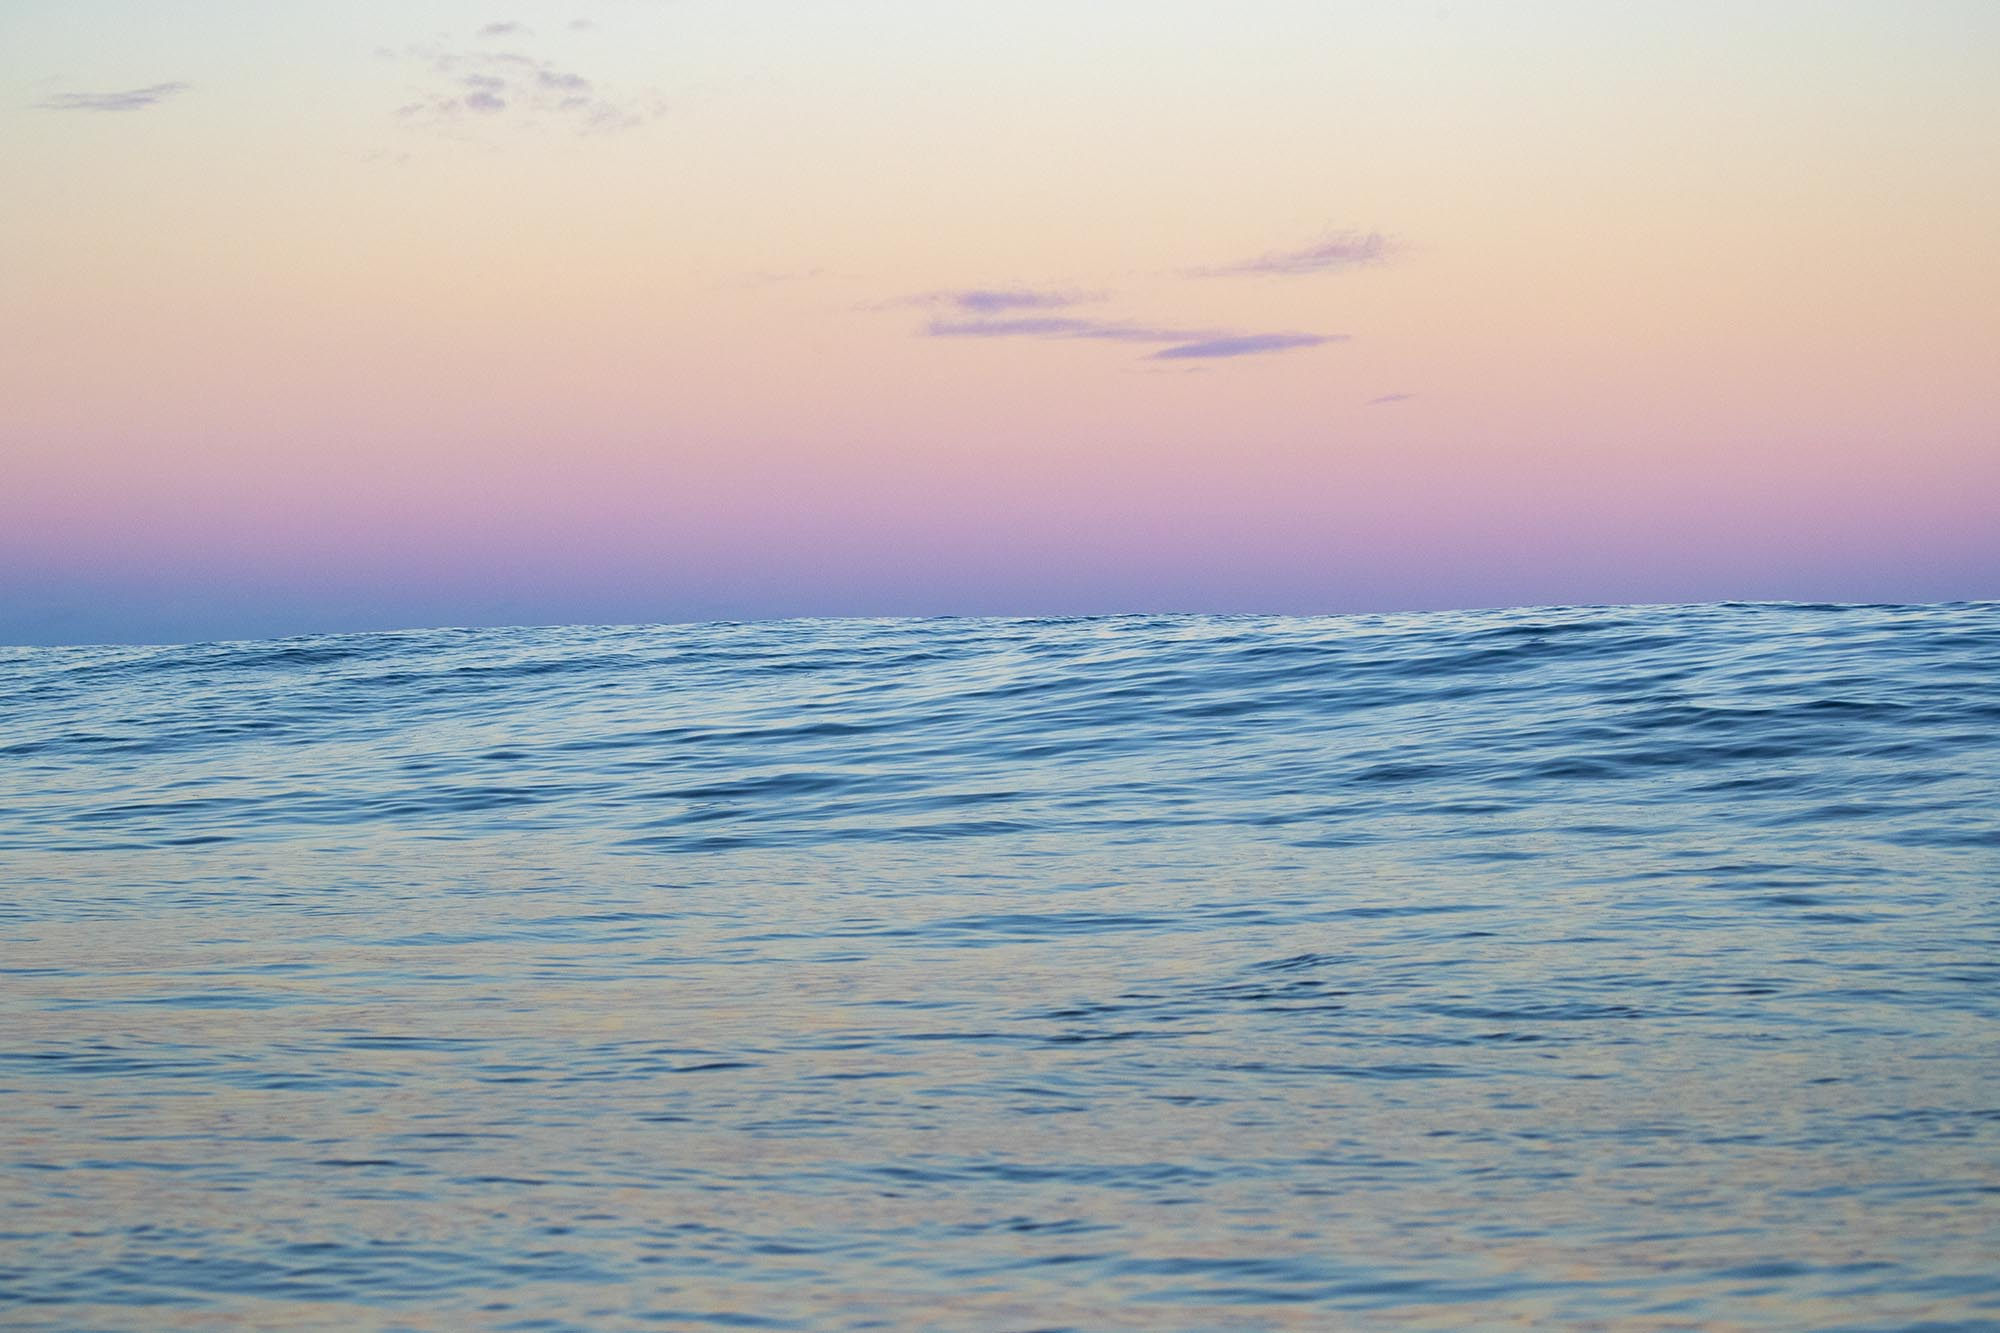 rodd-owen-surf-photography-for-sale-sunrise.jpg